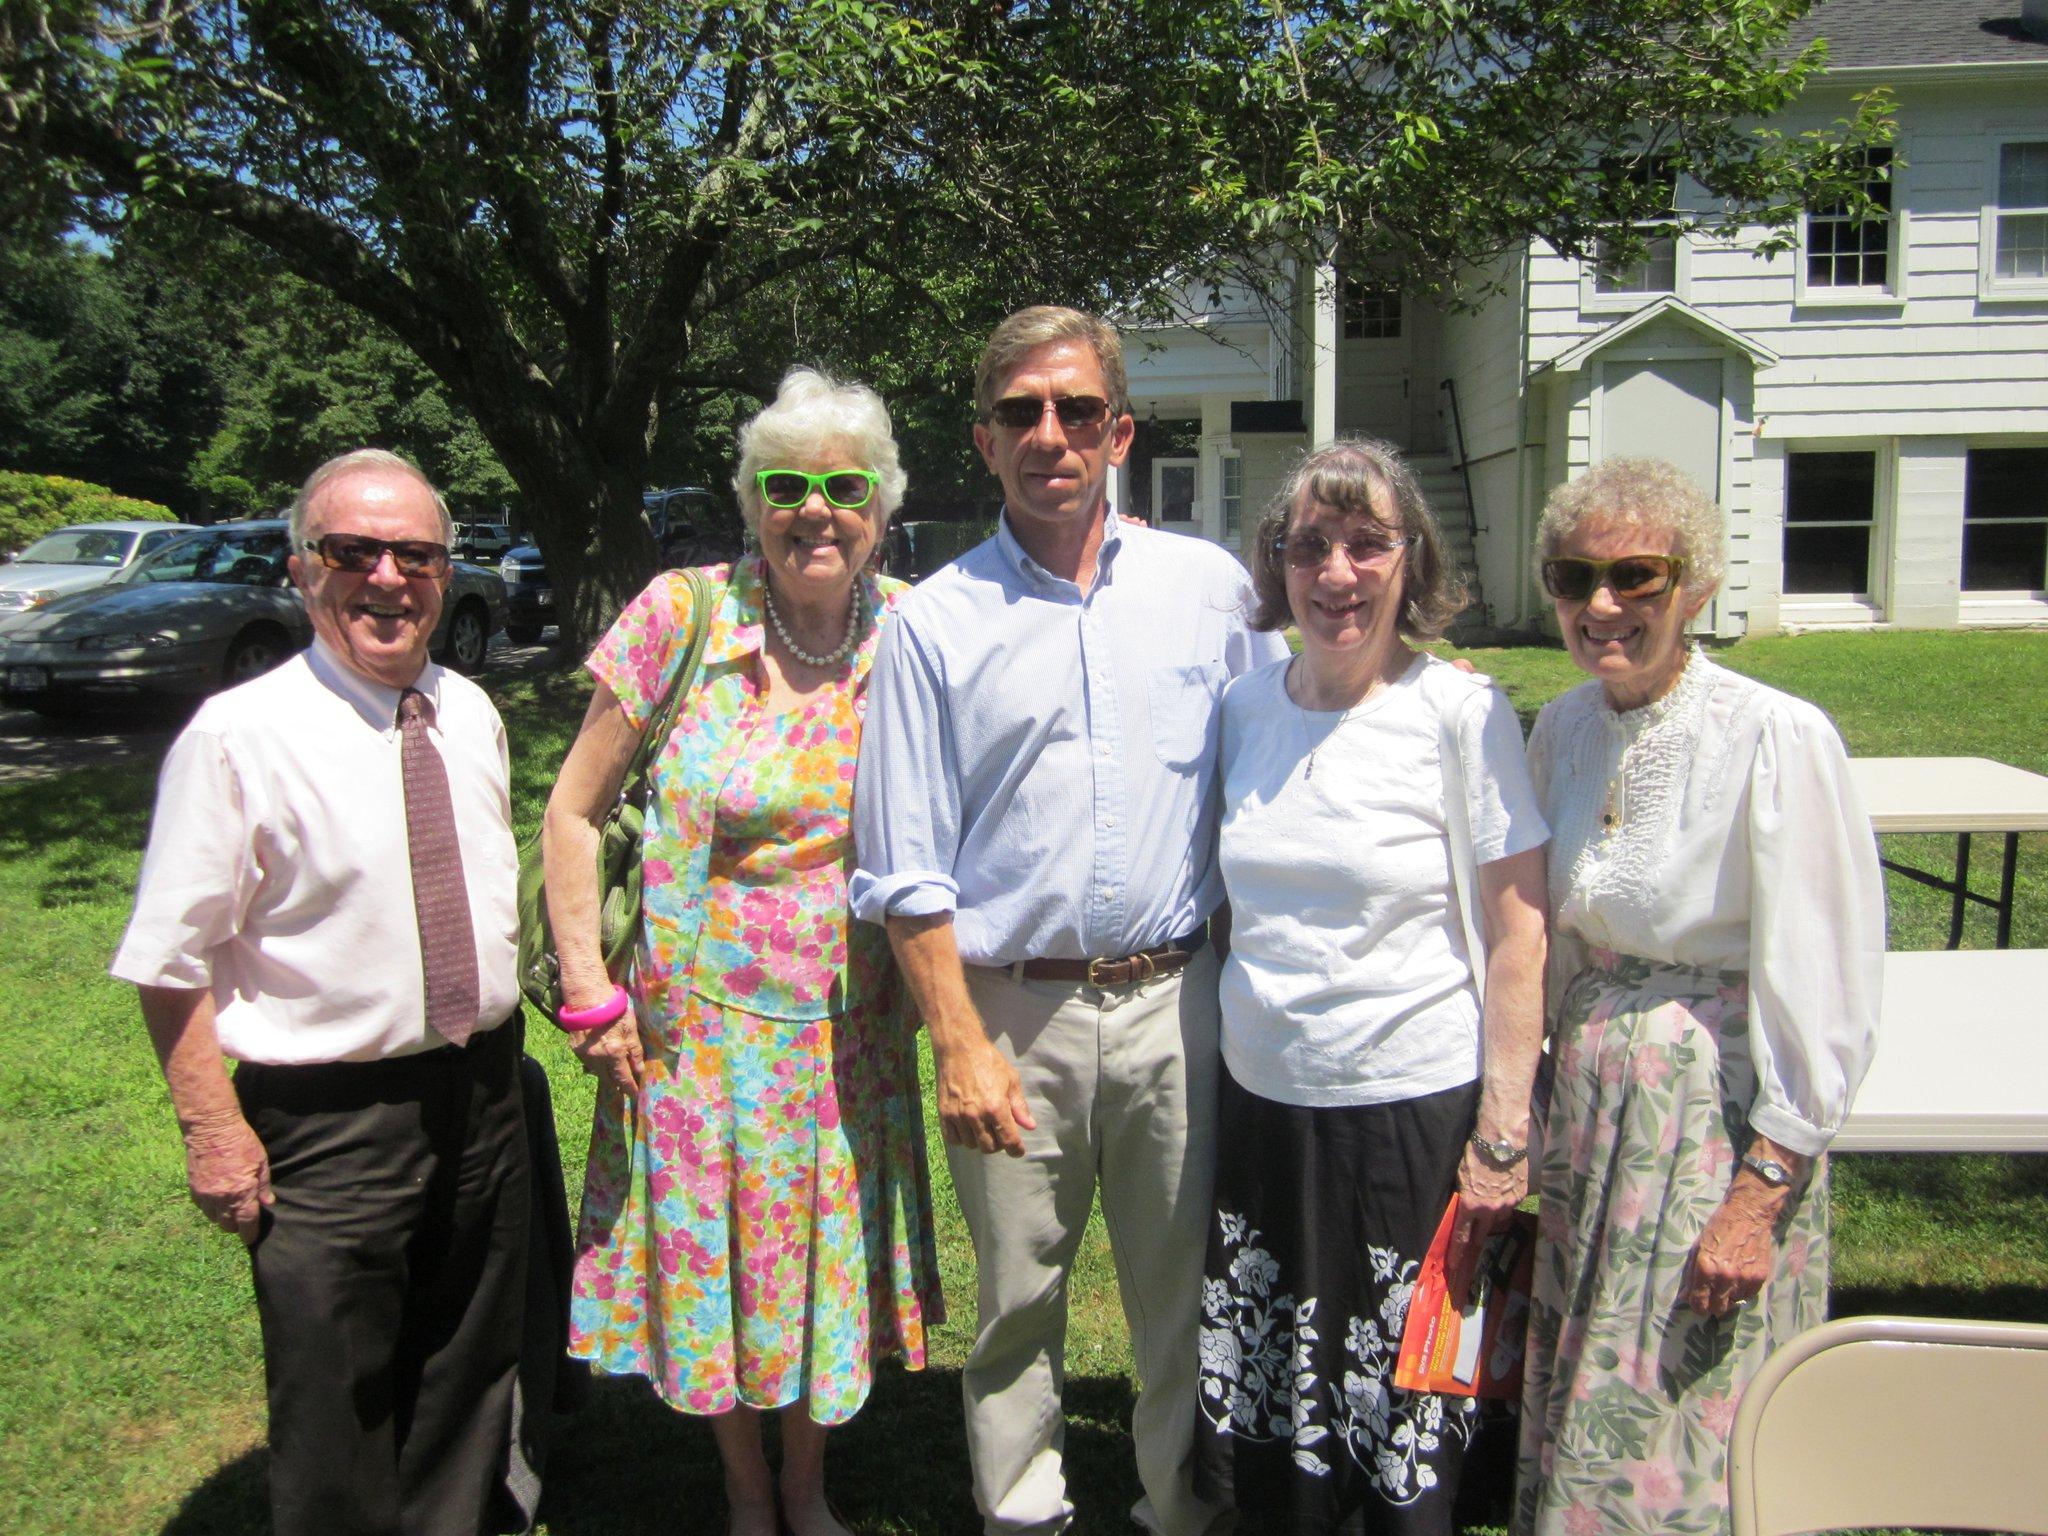 2011 visit to East Hampton